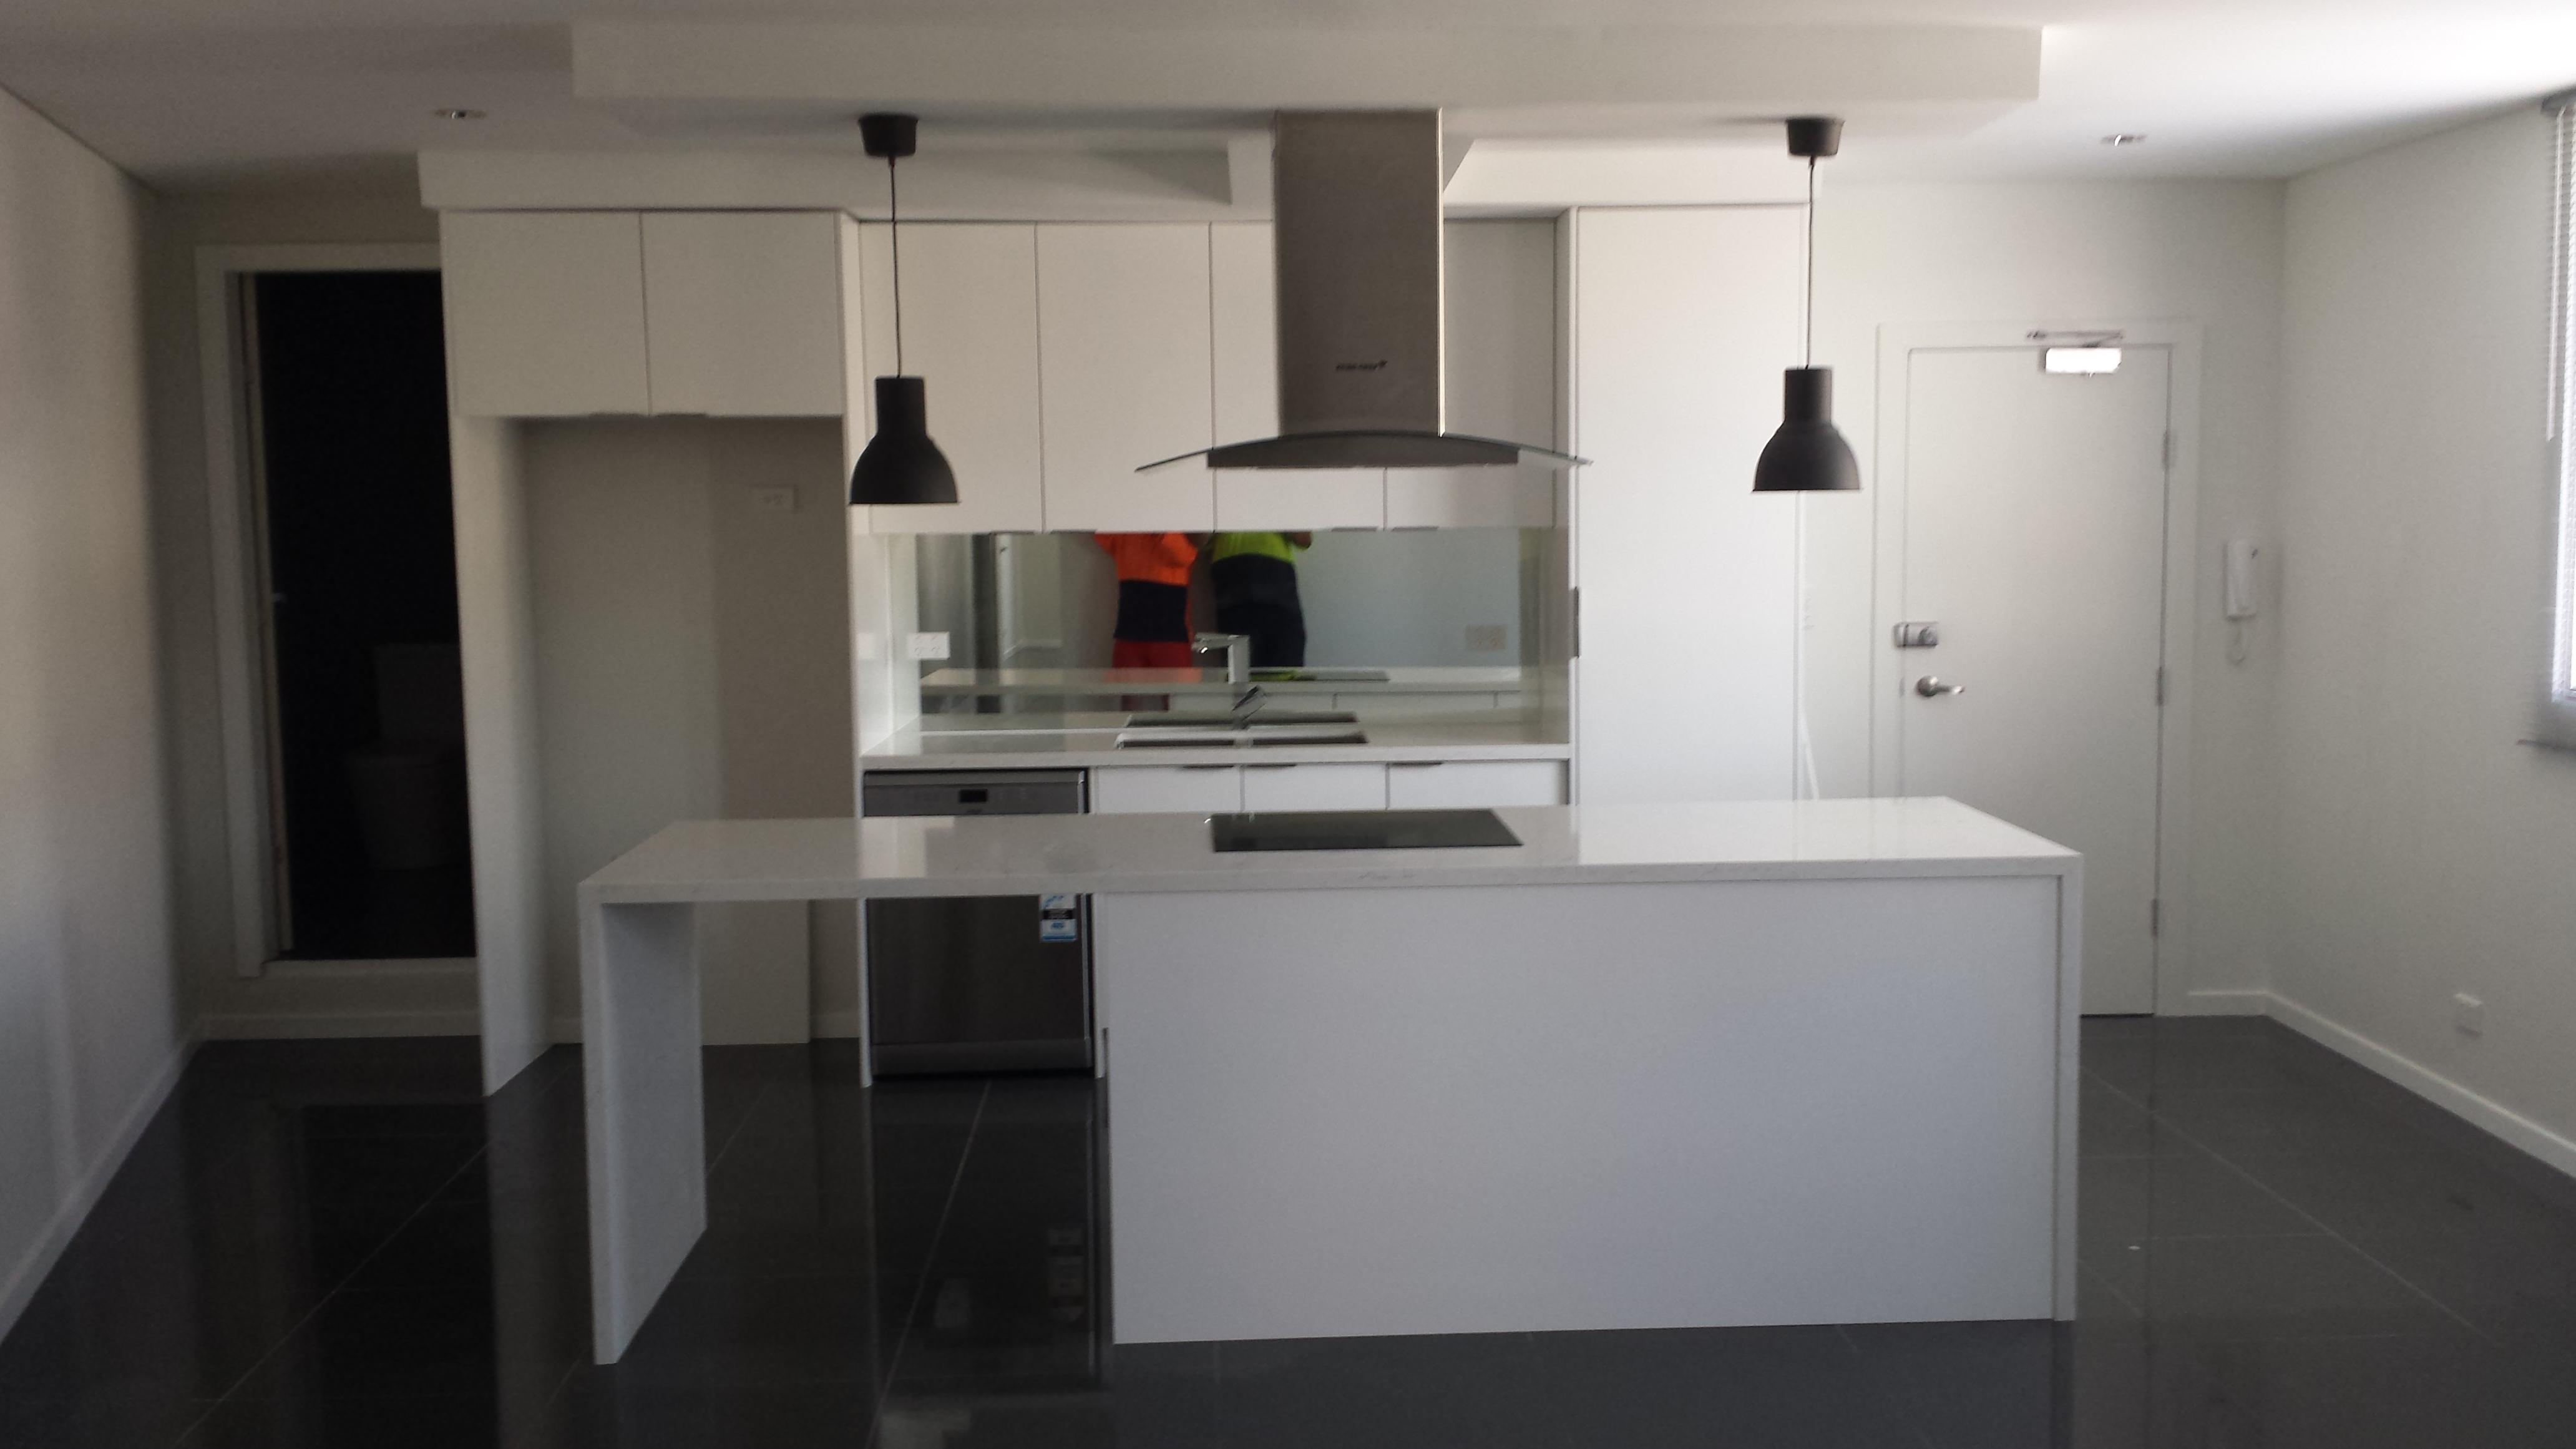 3 Bedroom Unit Conversion U2013 Inner West Sydney